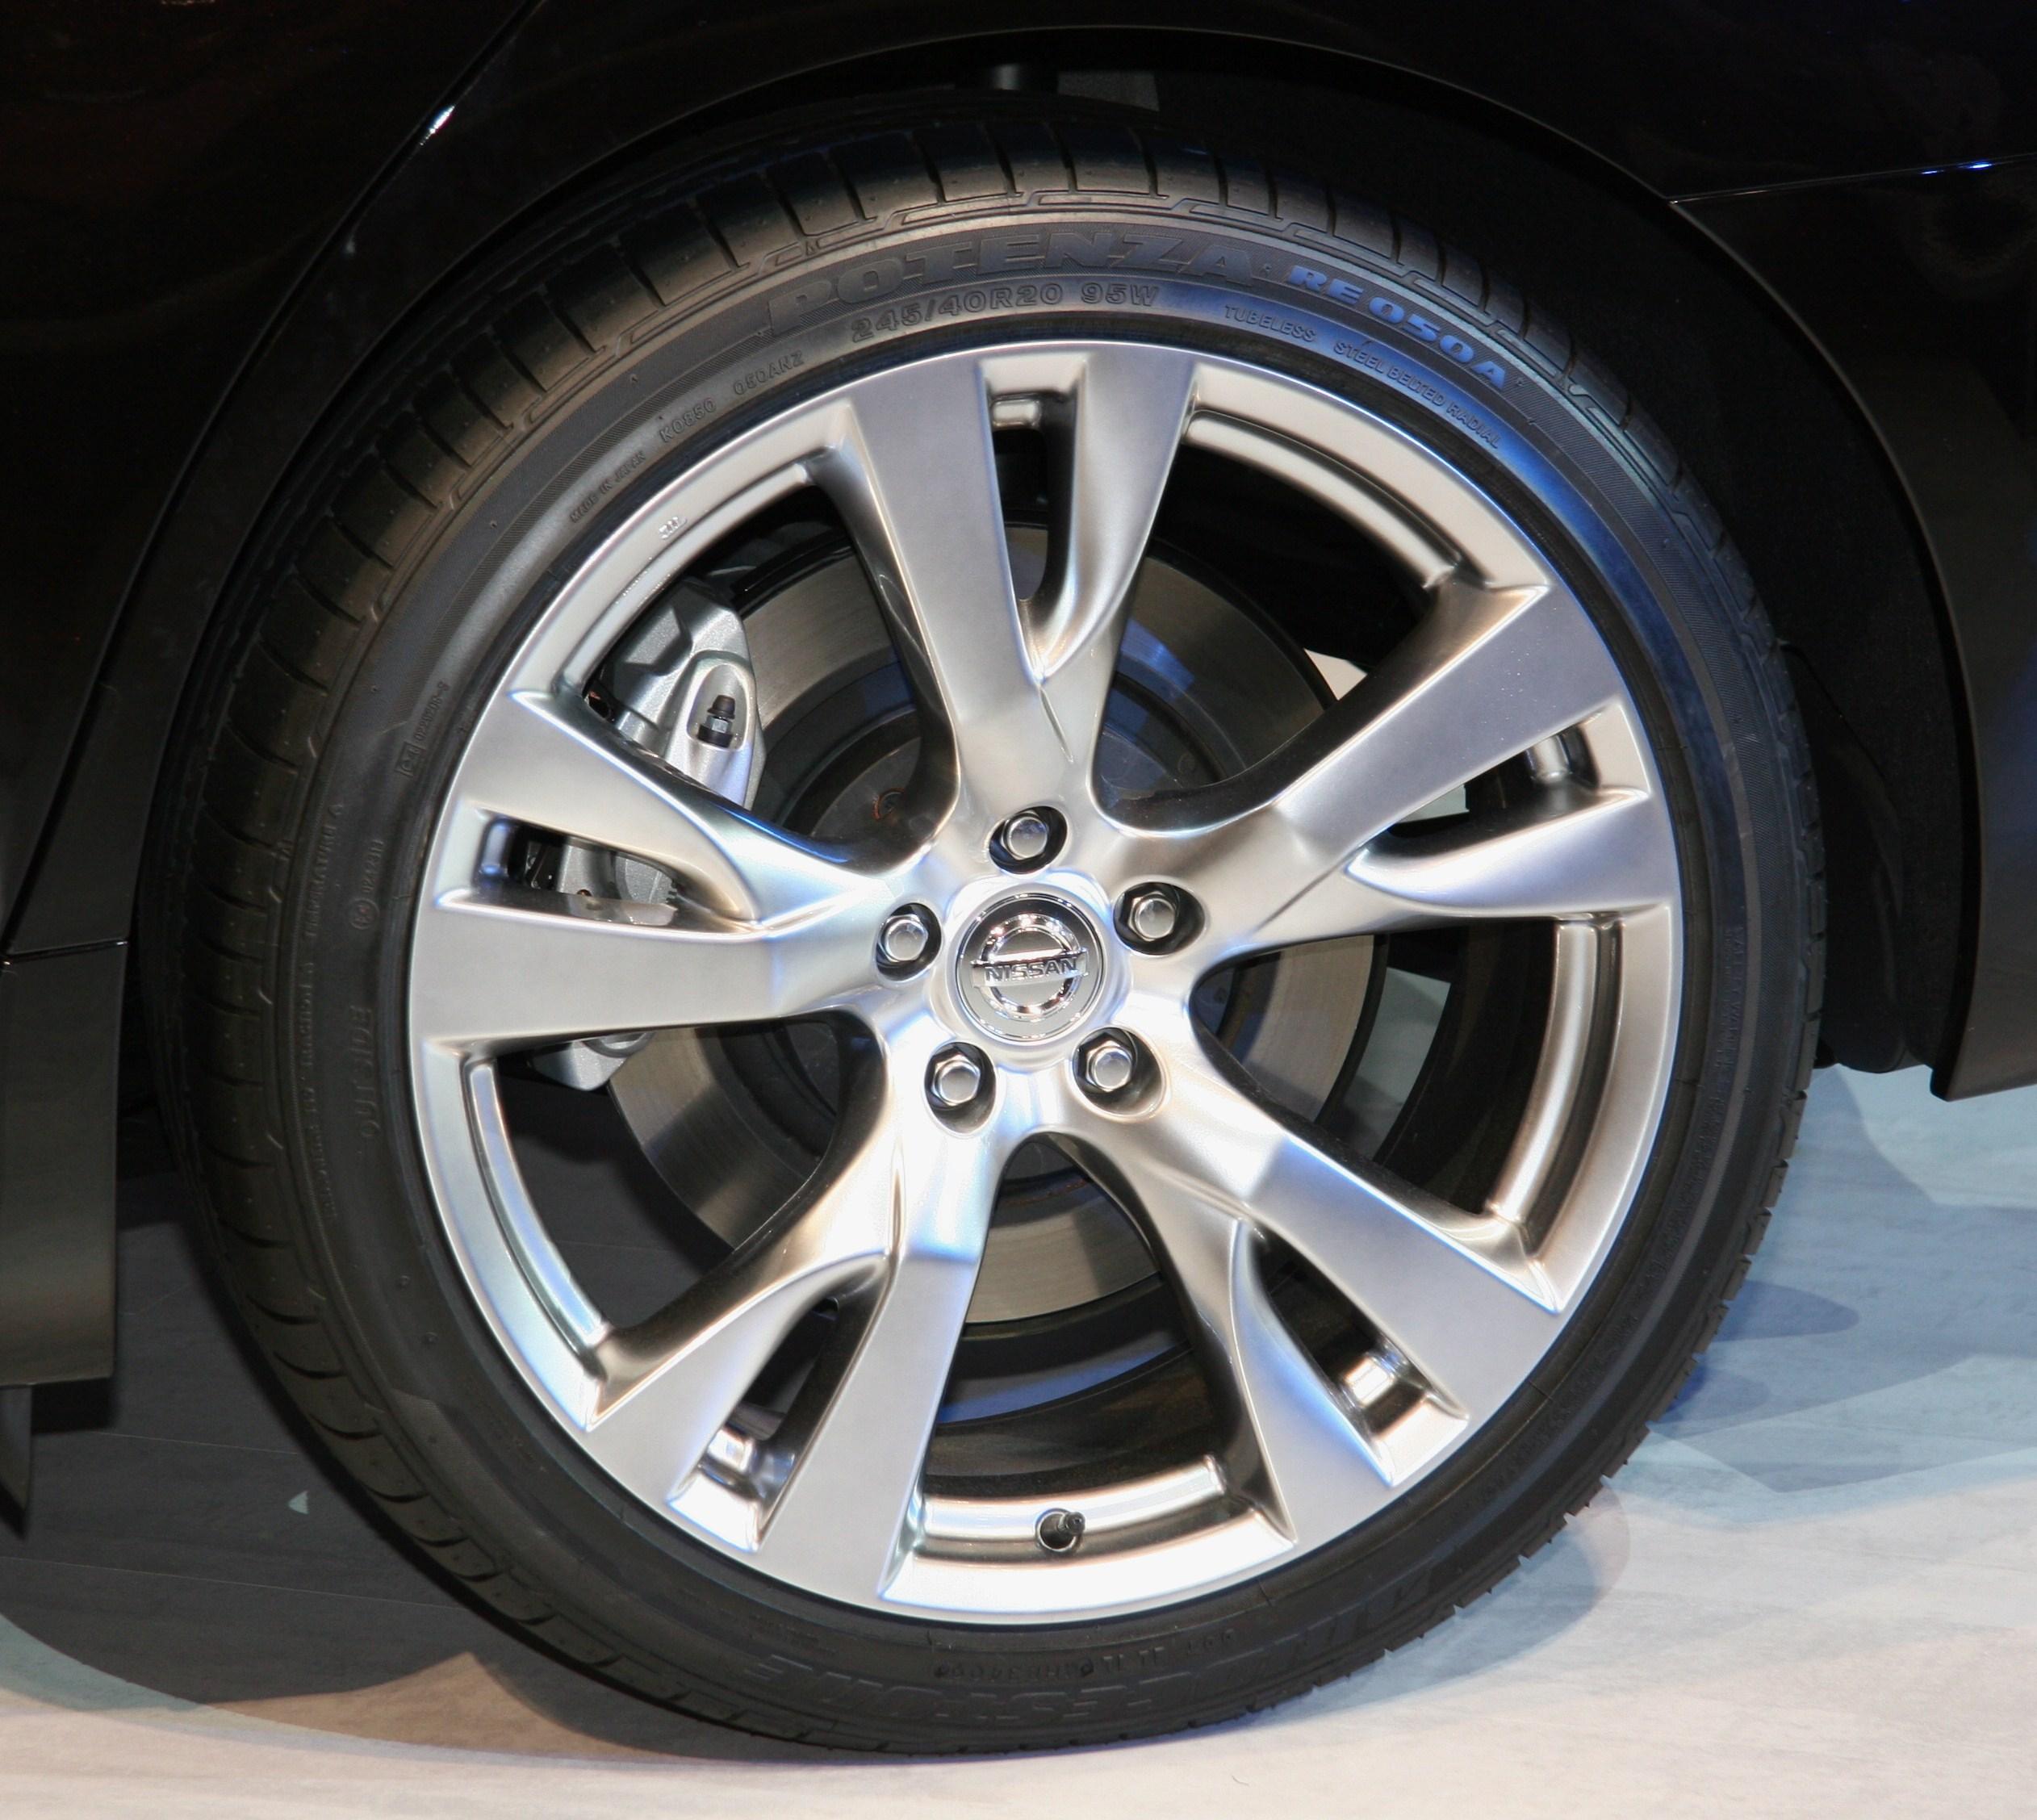 cars golf for r closeup wheels wheel mods audi sale